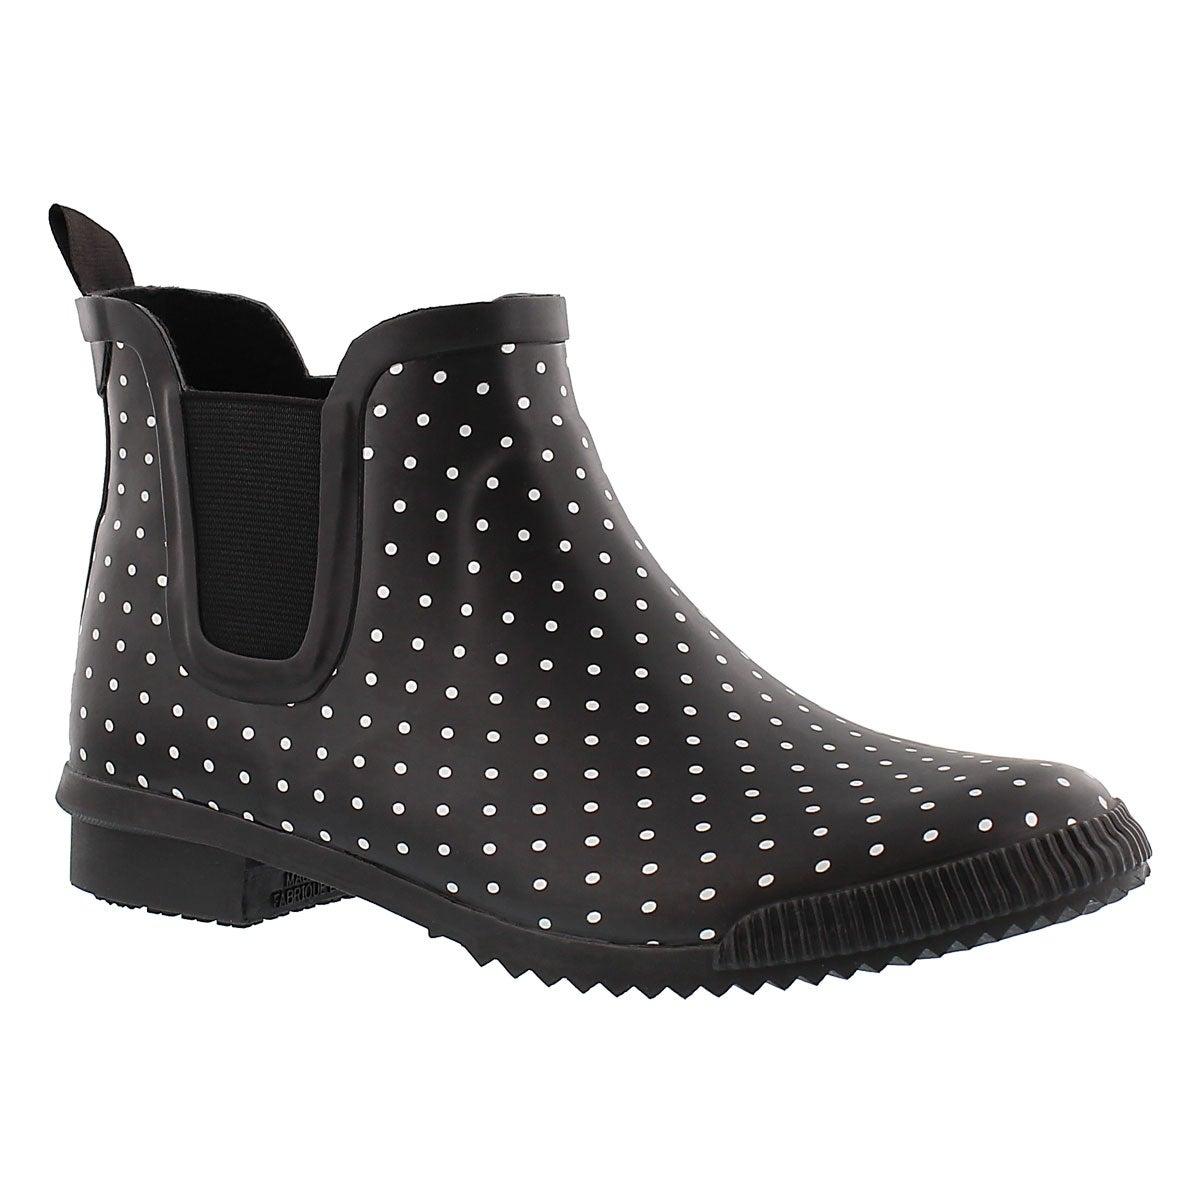 Lds Regent blk polka dot short boot